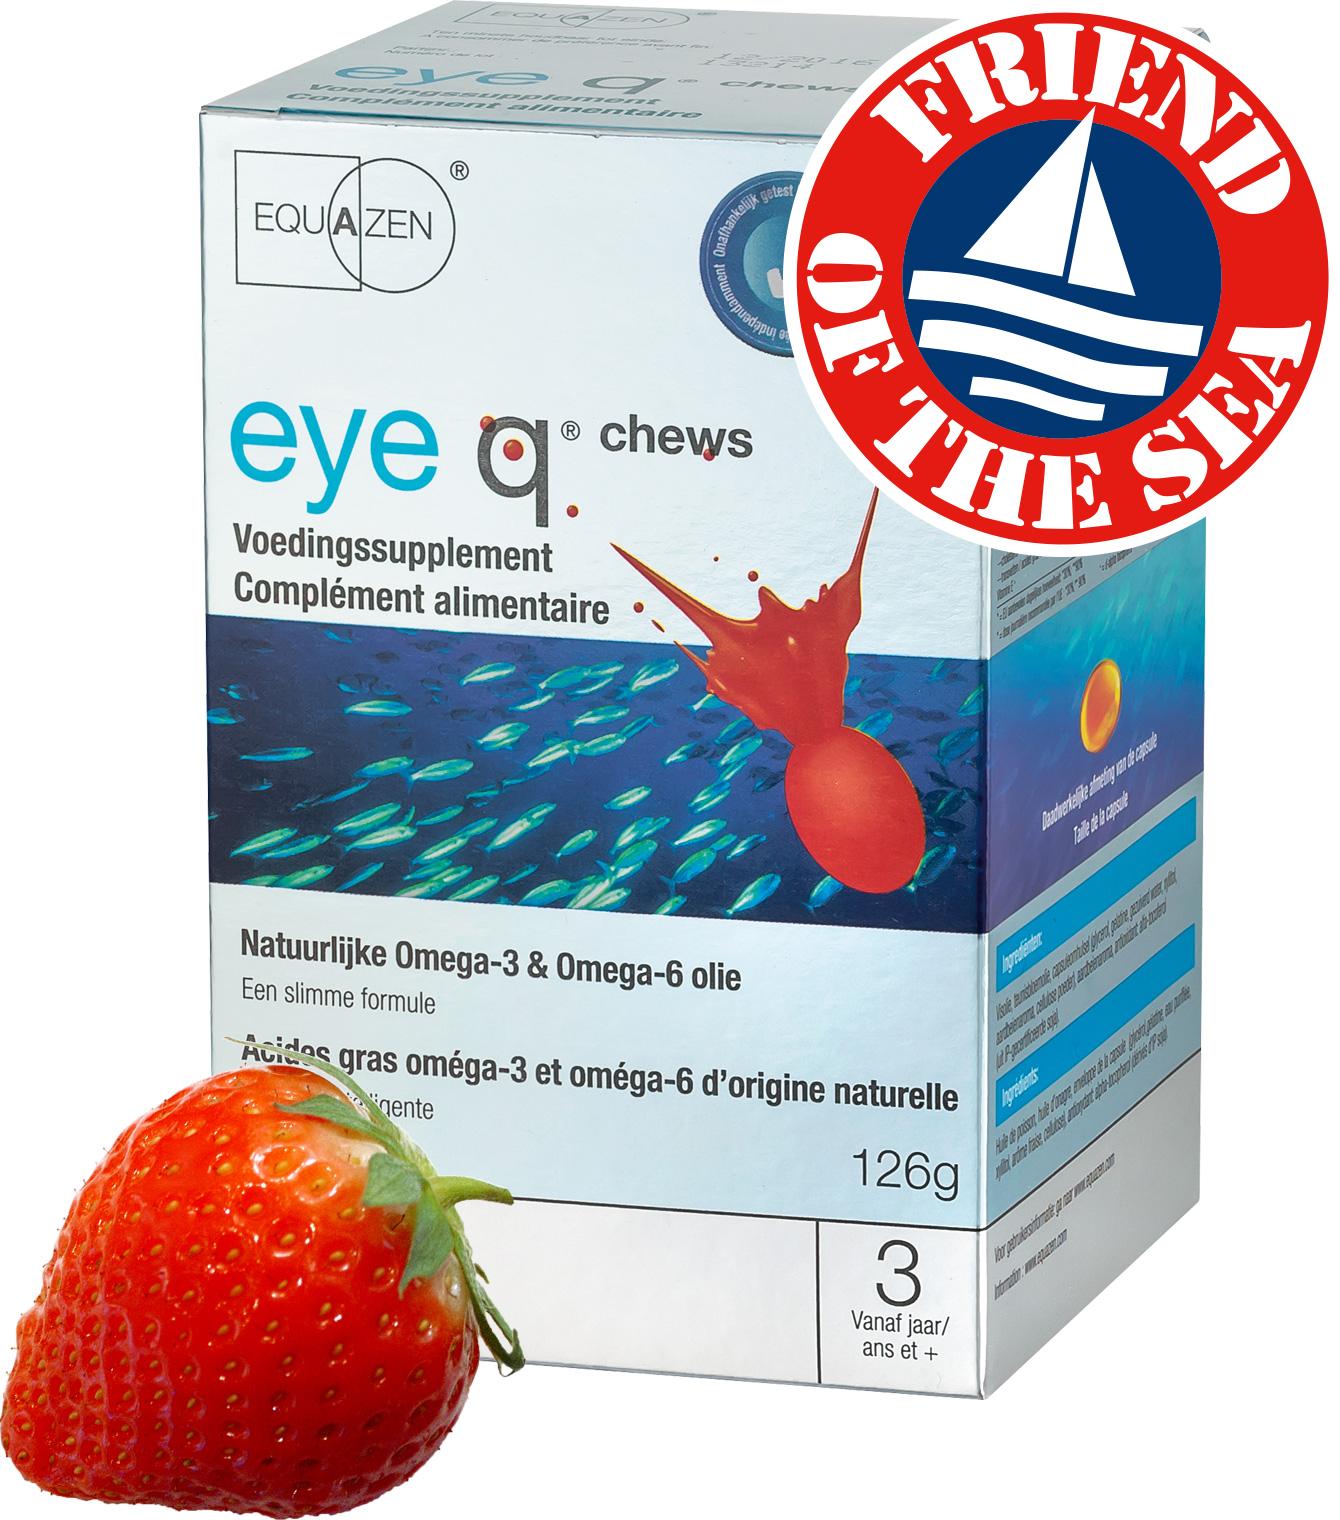 Equazen Eye Q chews